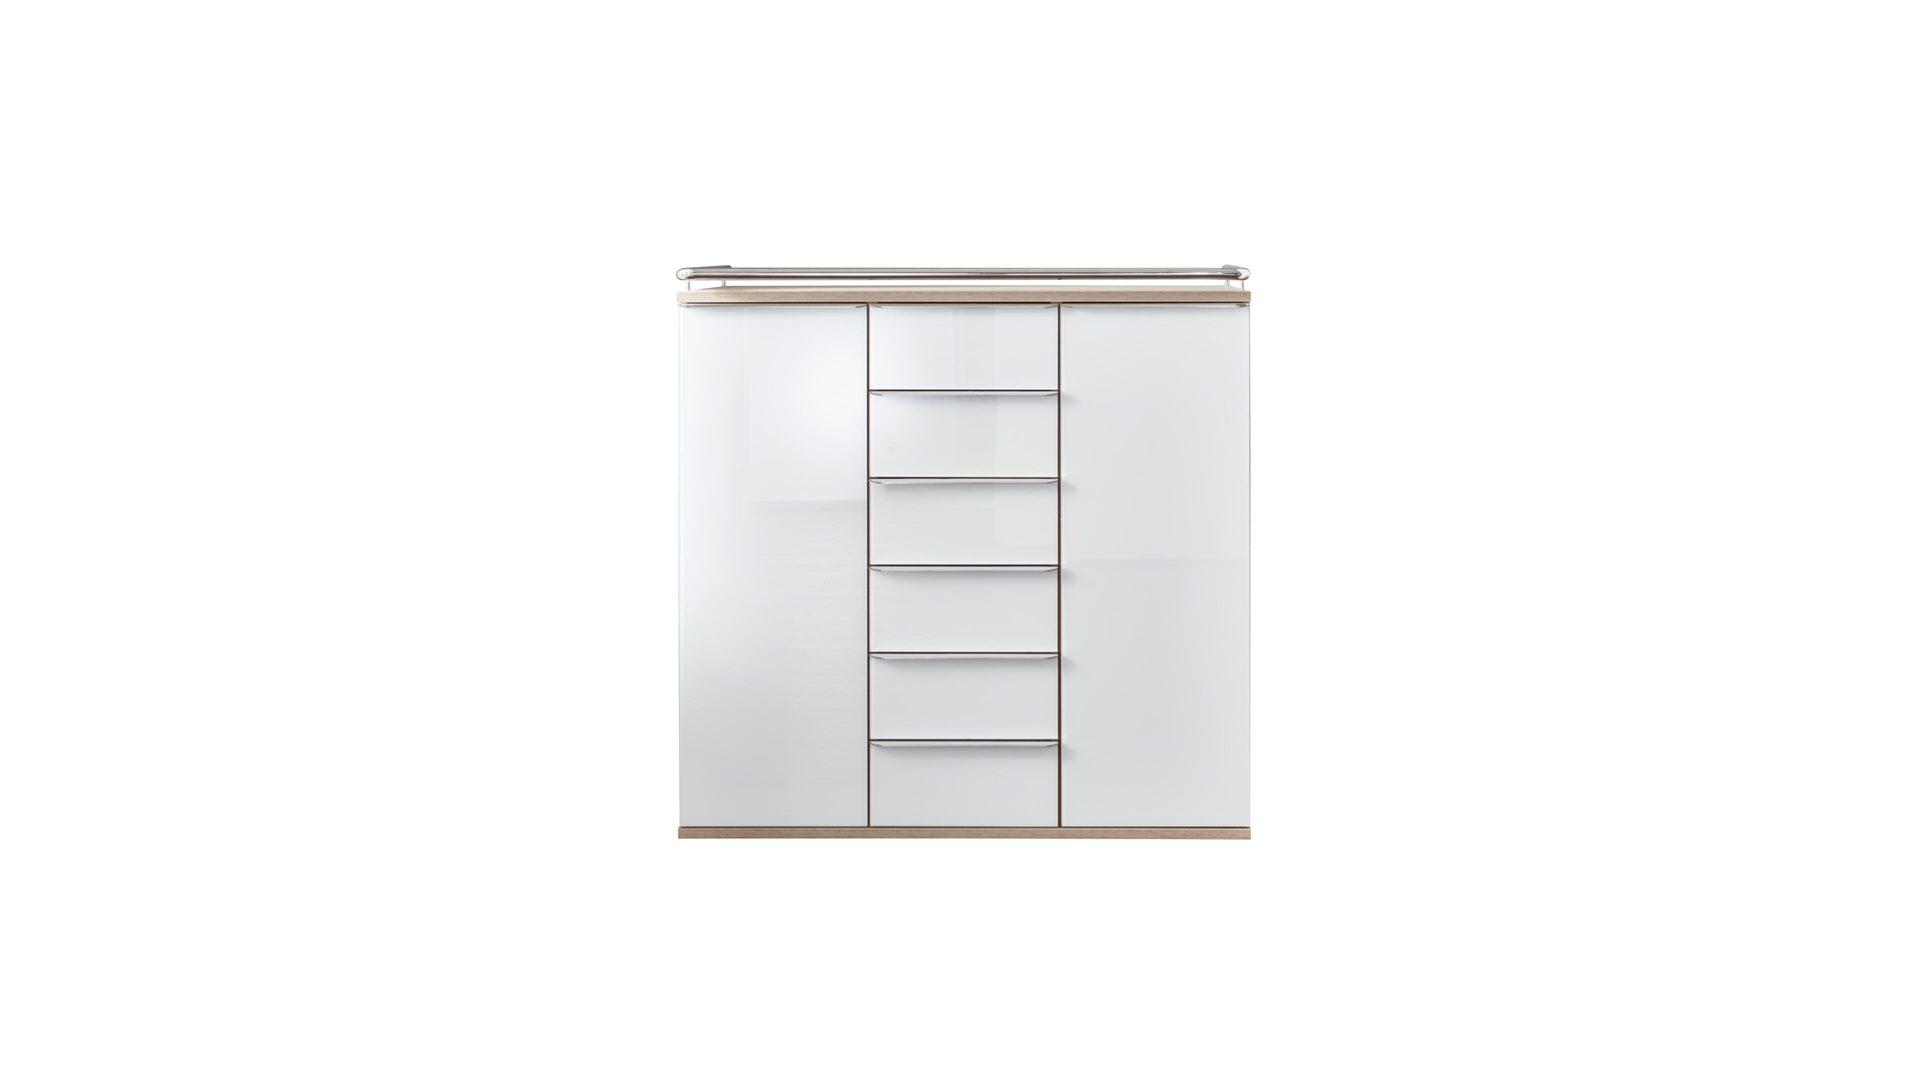 Möbel Boer Coesfeld, Räume, Schlafzimmer, Kommoden + ...